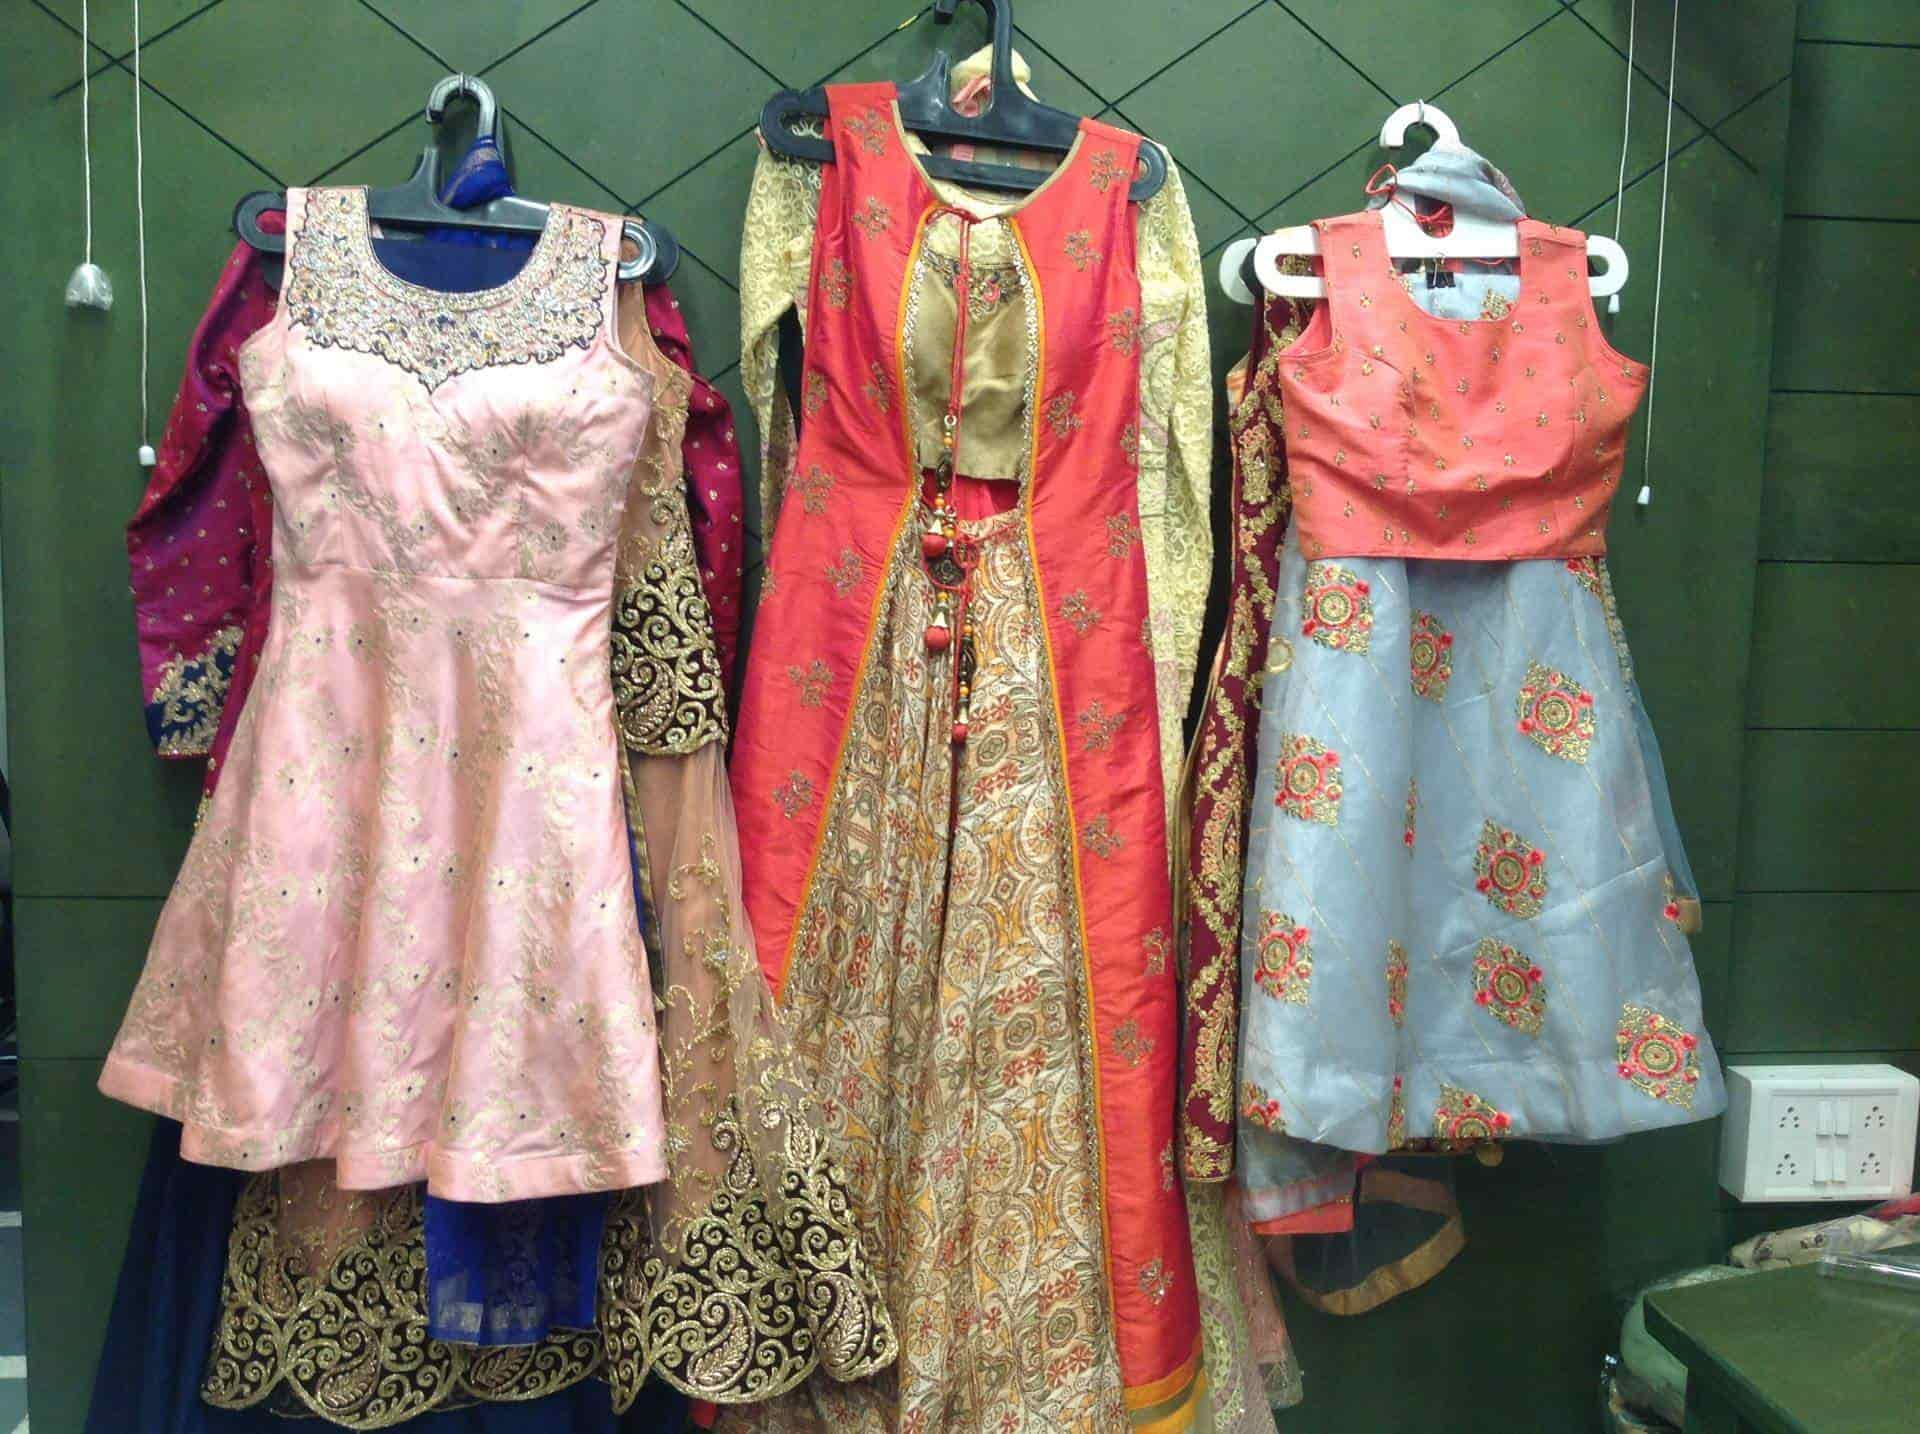 Fashion Designers In Vadodara Clothes For Men Women Kids Vadodara Justdial